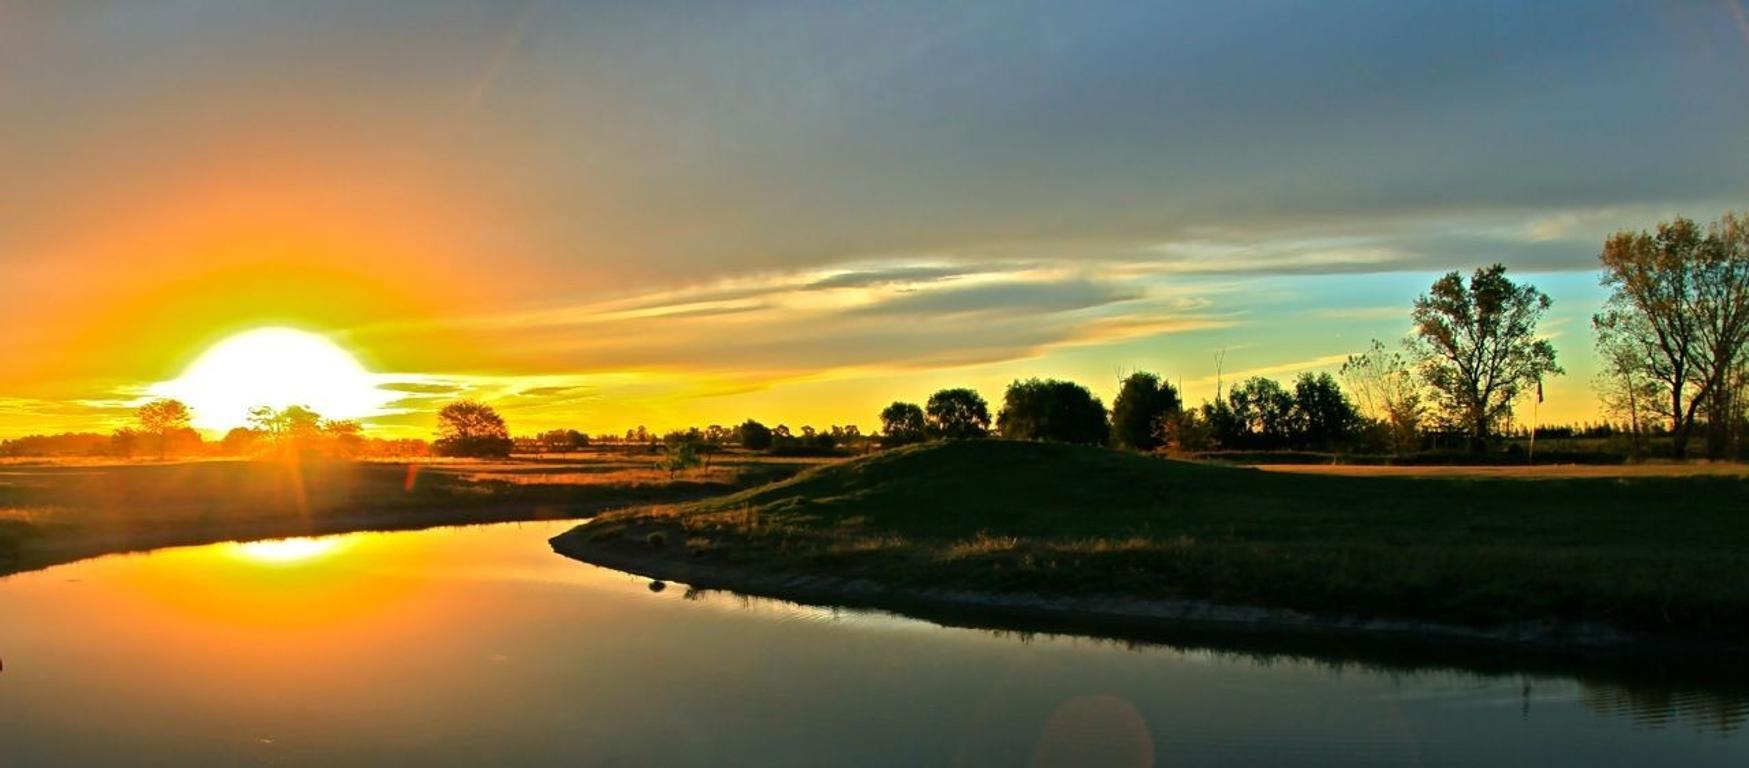 Tizado Pilar vende lotes al golf en Medal CC, Pilar y Alrededores - PIL3849_LP172621_1